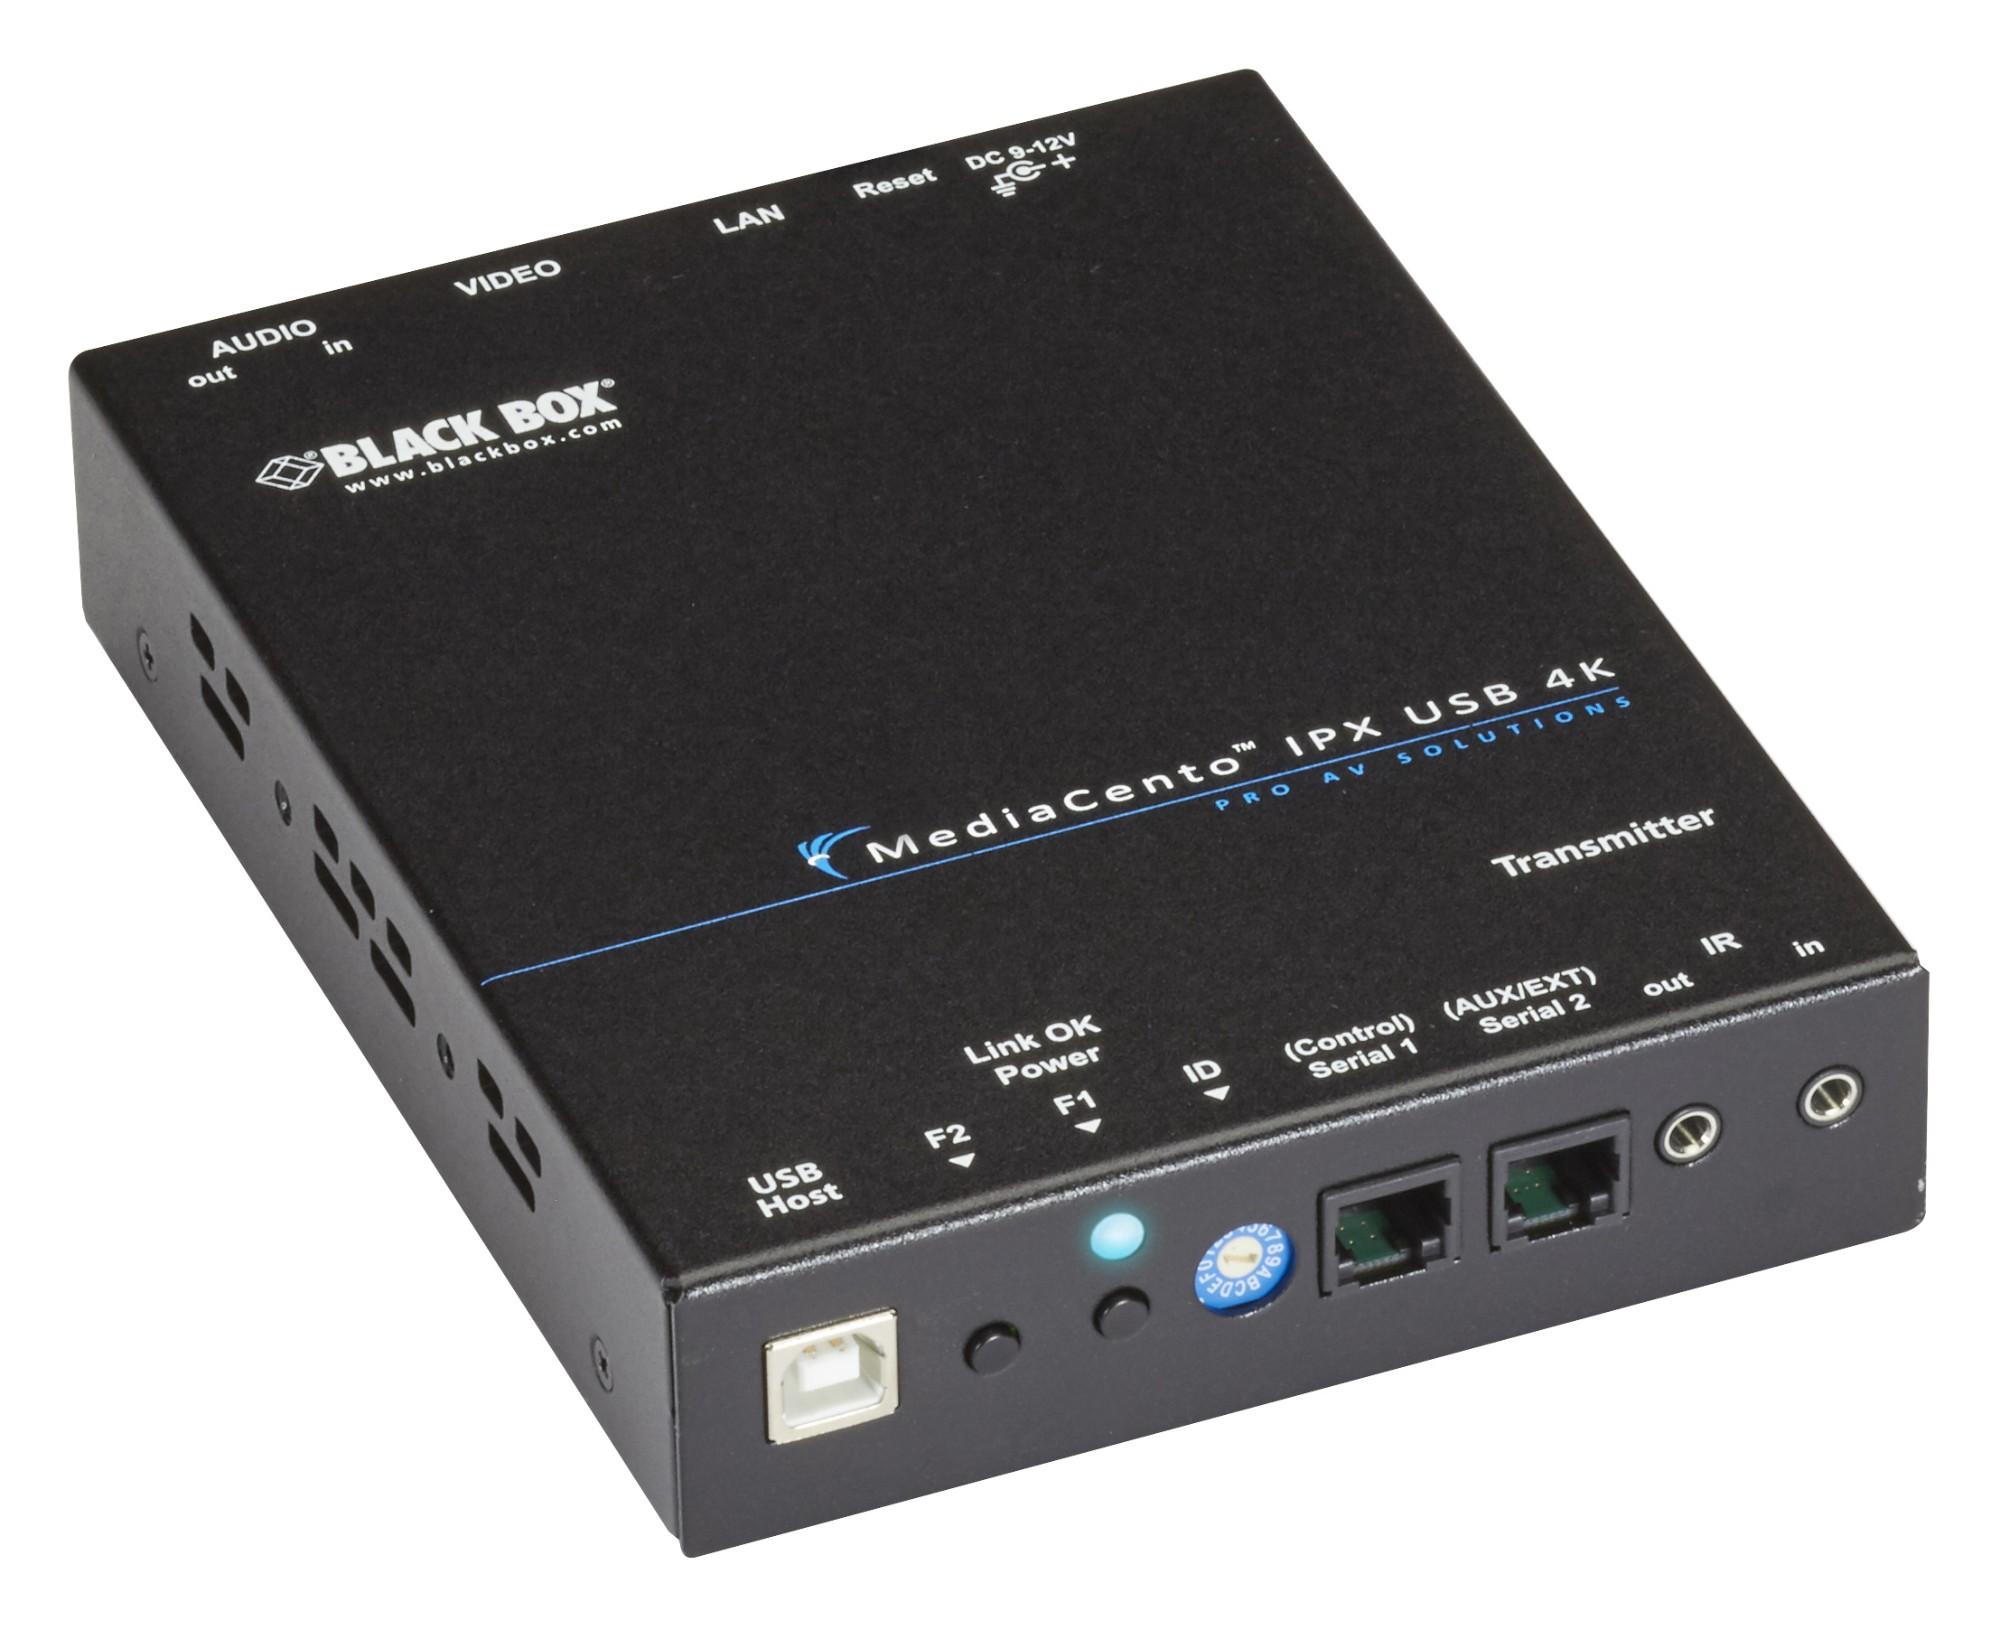 Black Box VX-HDMI-4K-TX AV transmitter AV extender